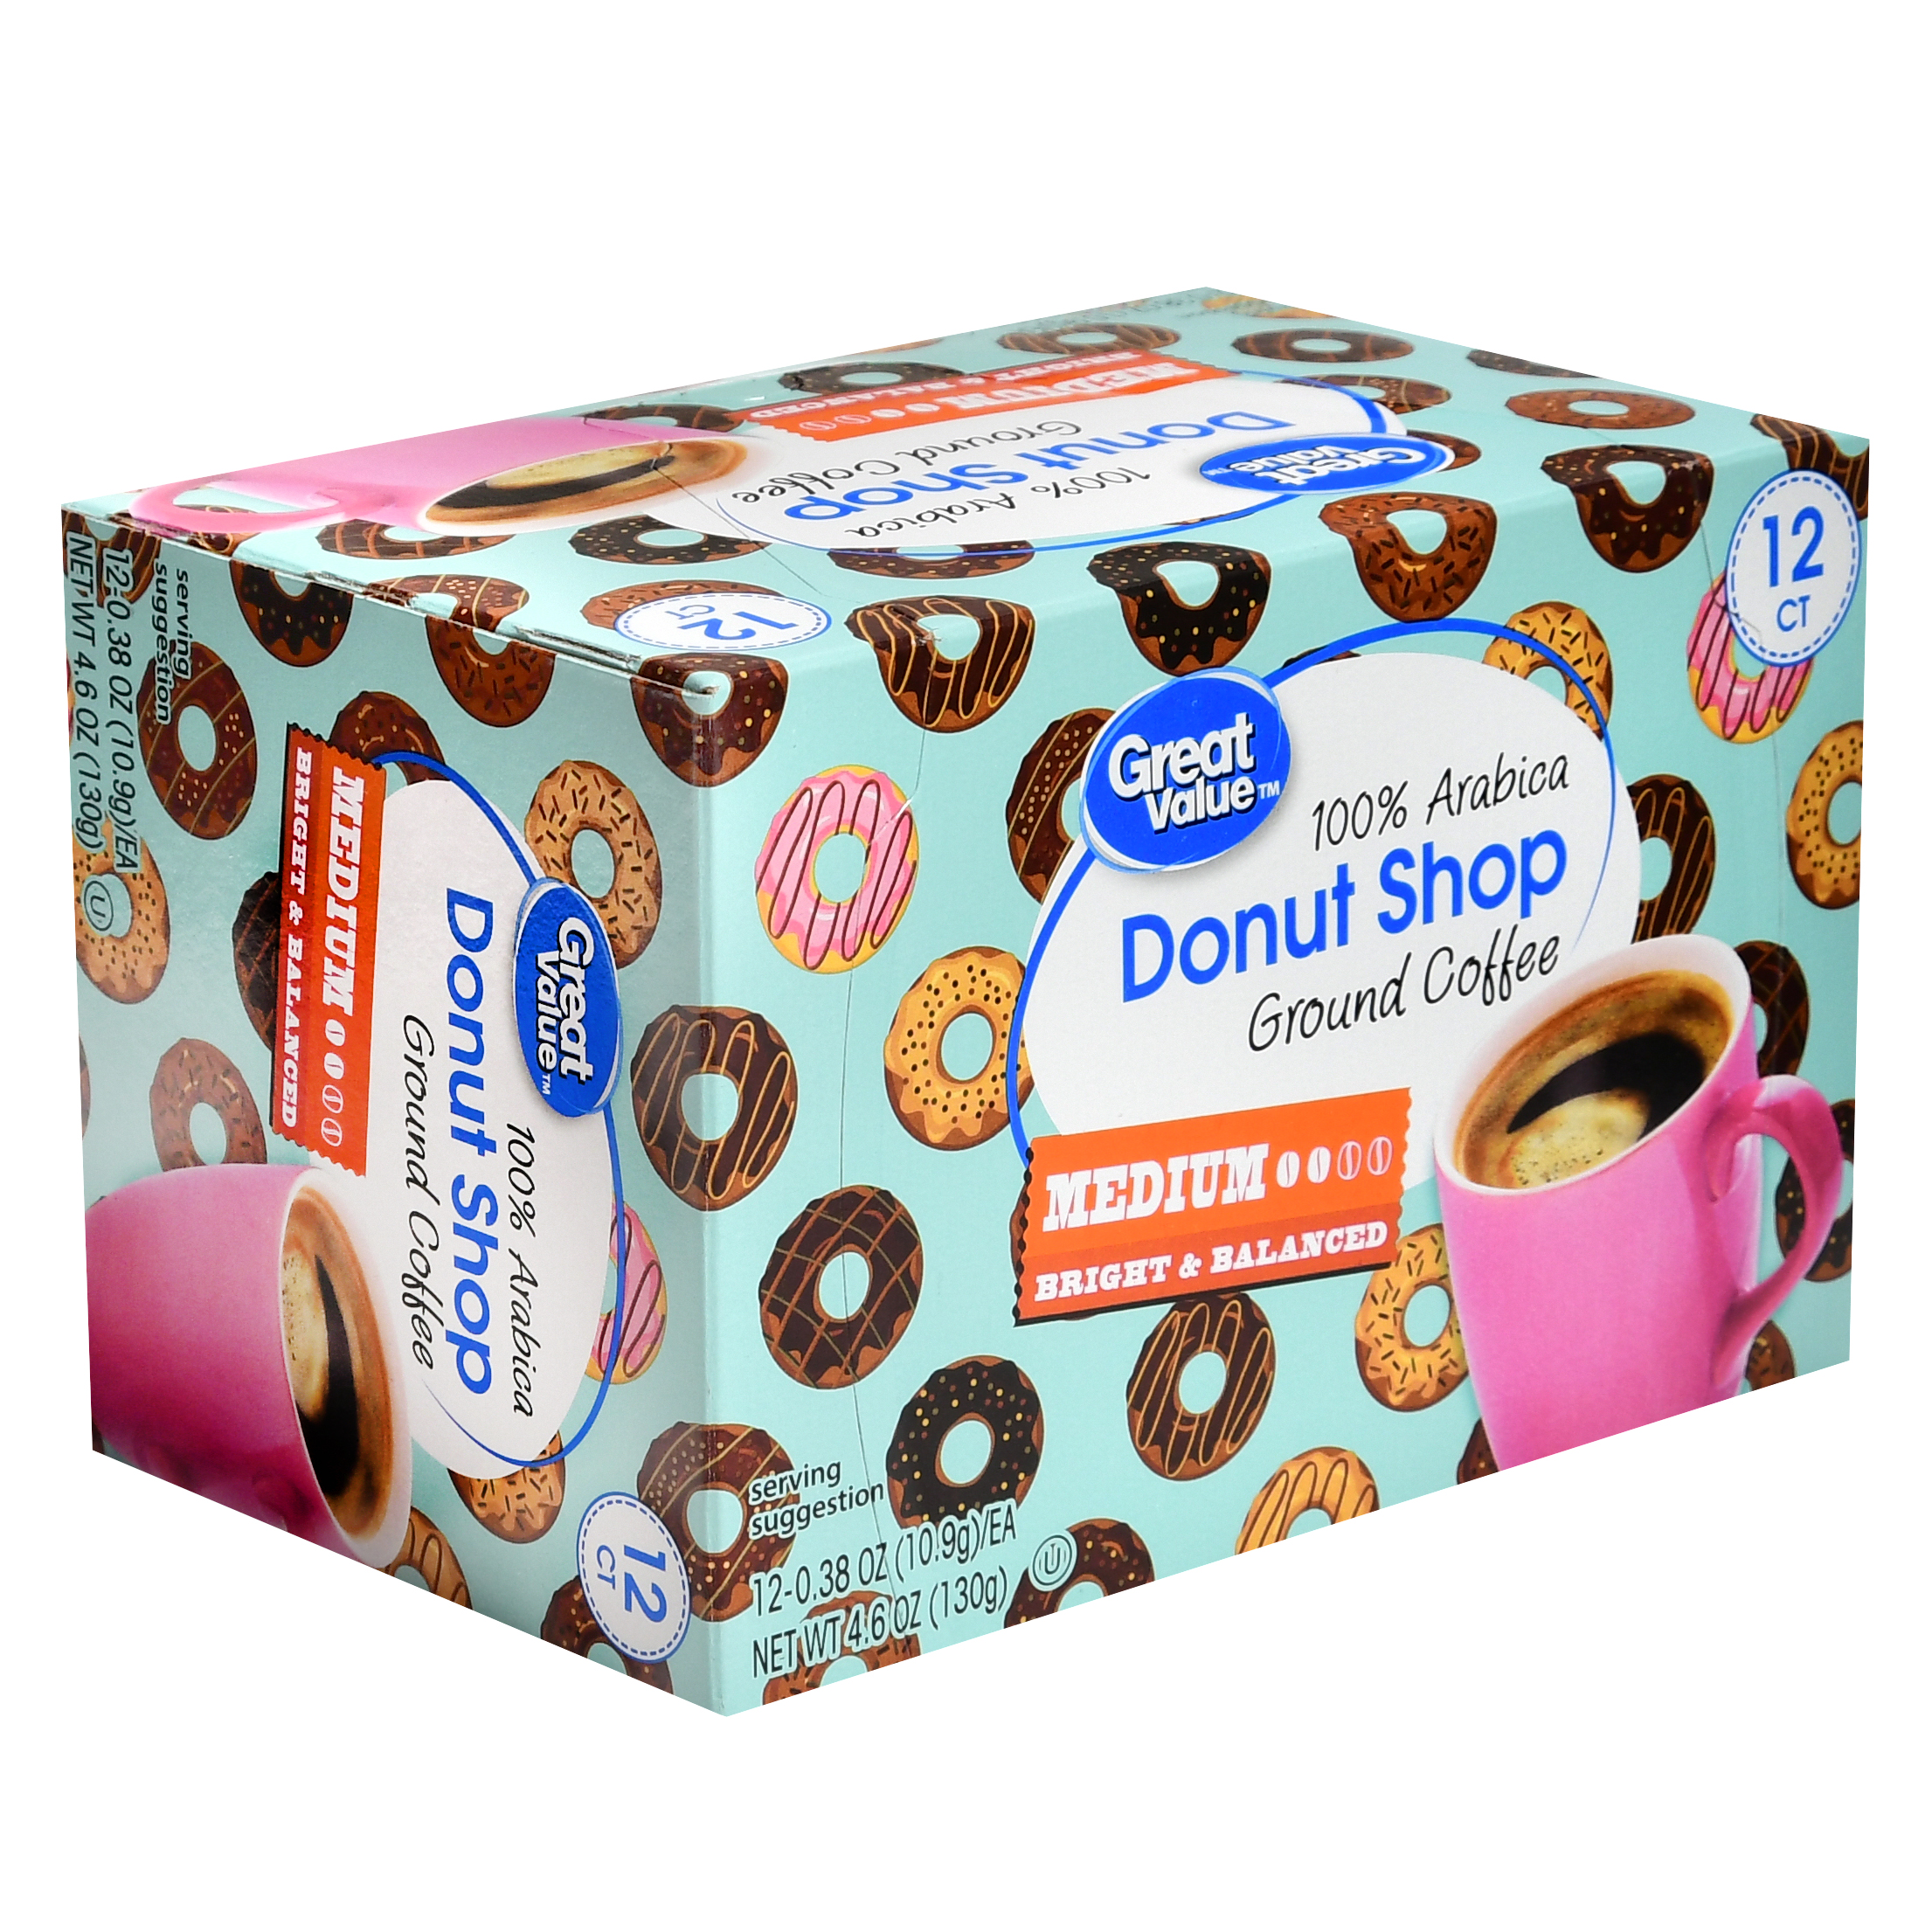 Great Value Donut Shop 100% Arabica Medium Ground Coffee, 0.38 oz, 12 count